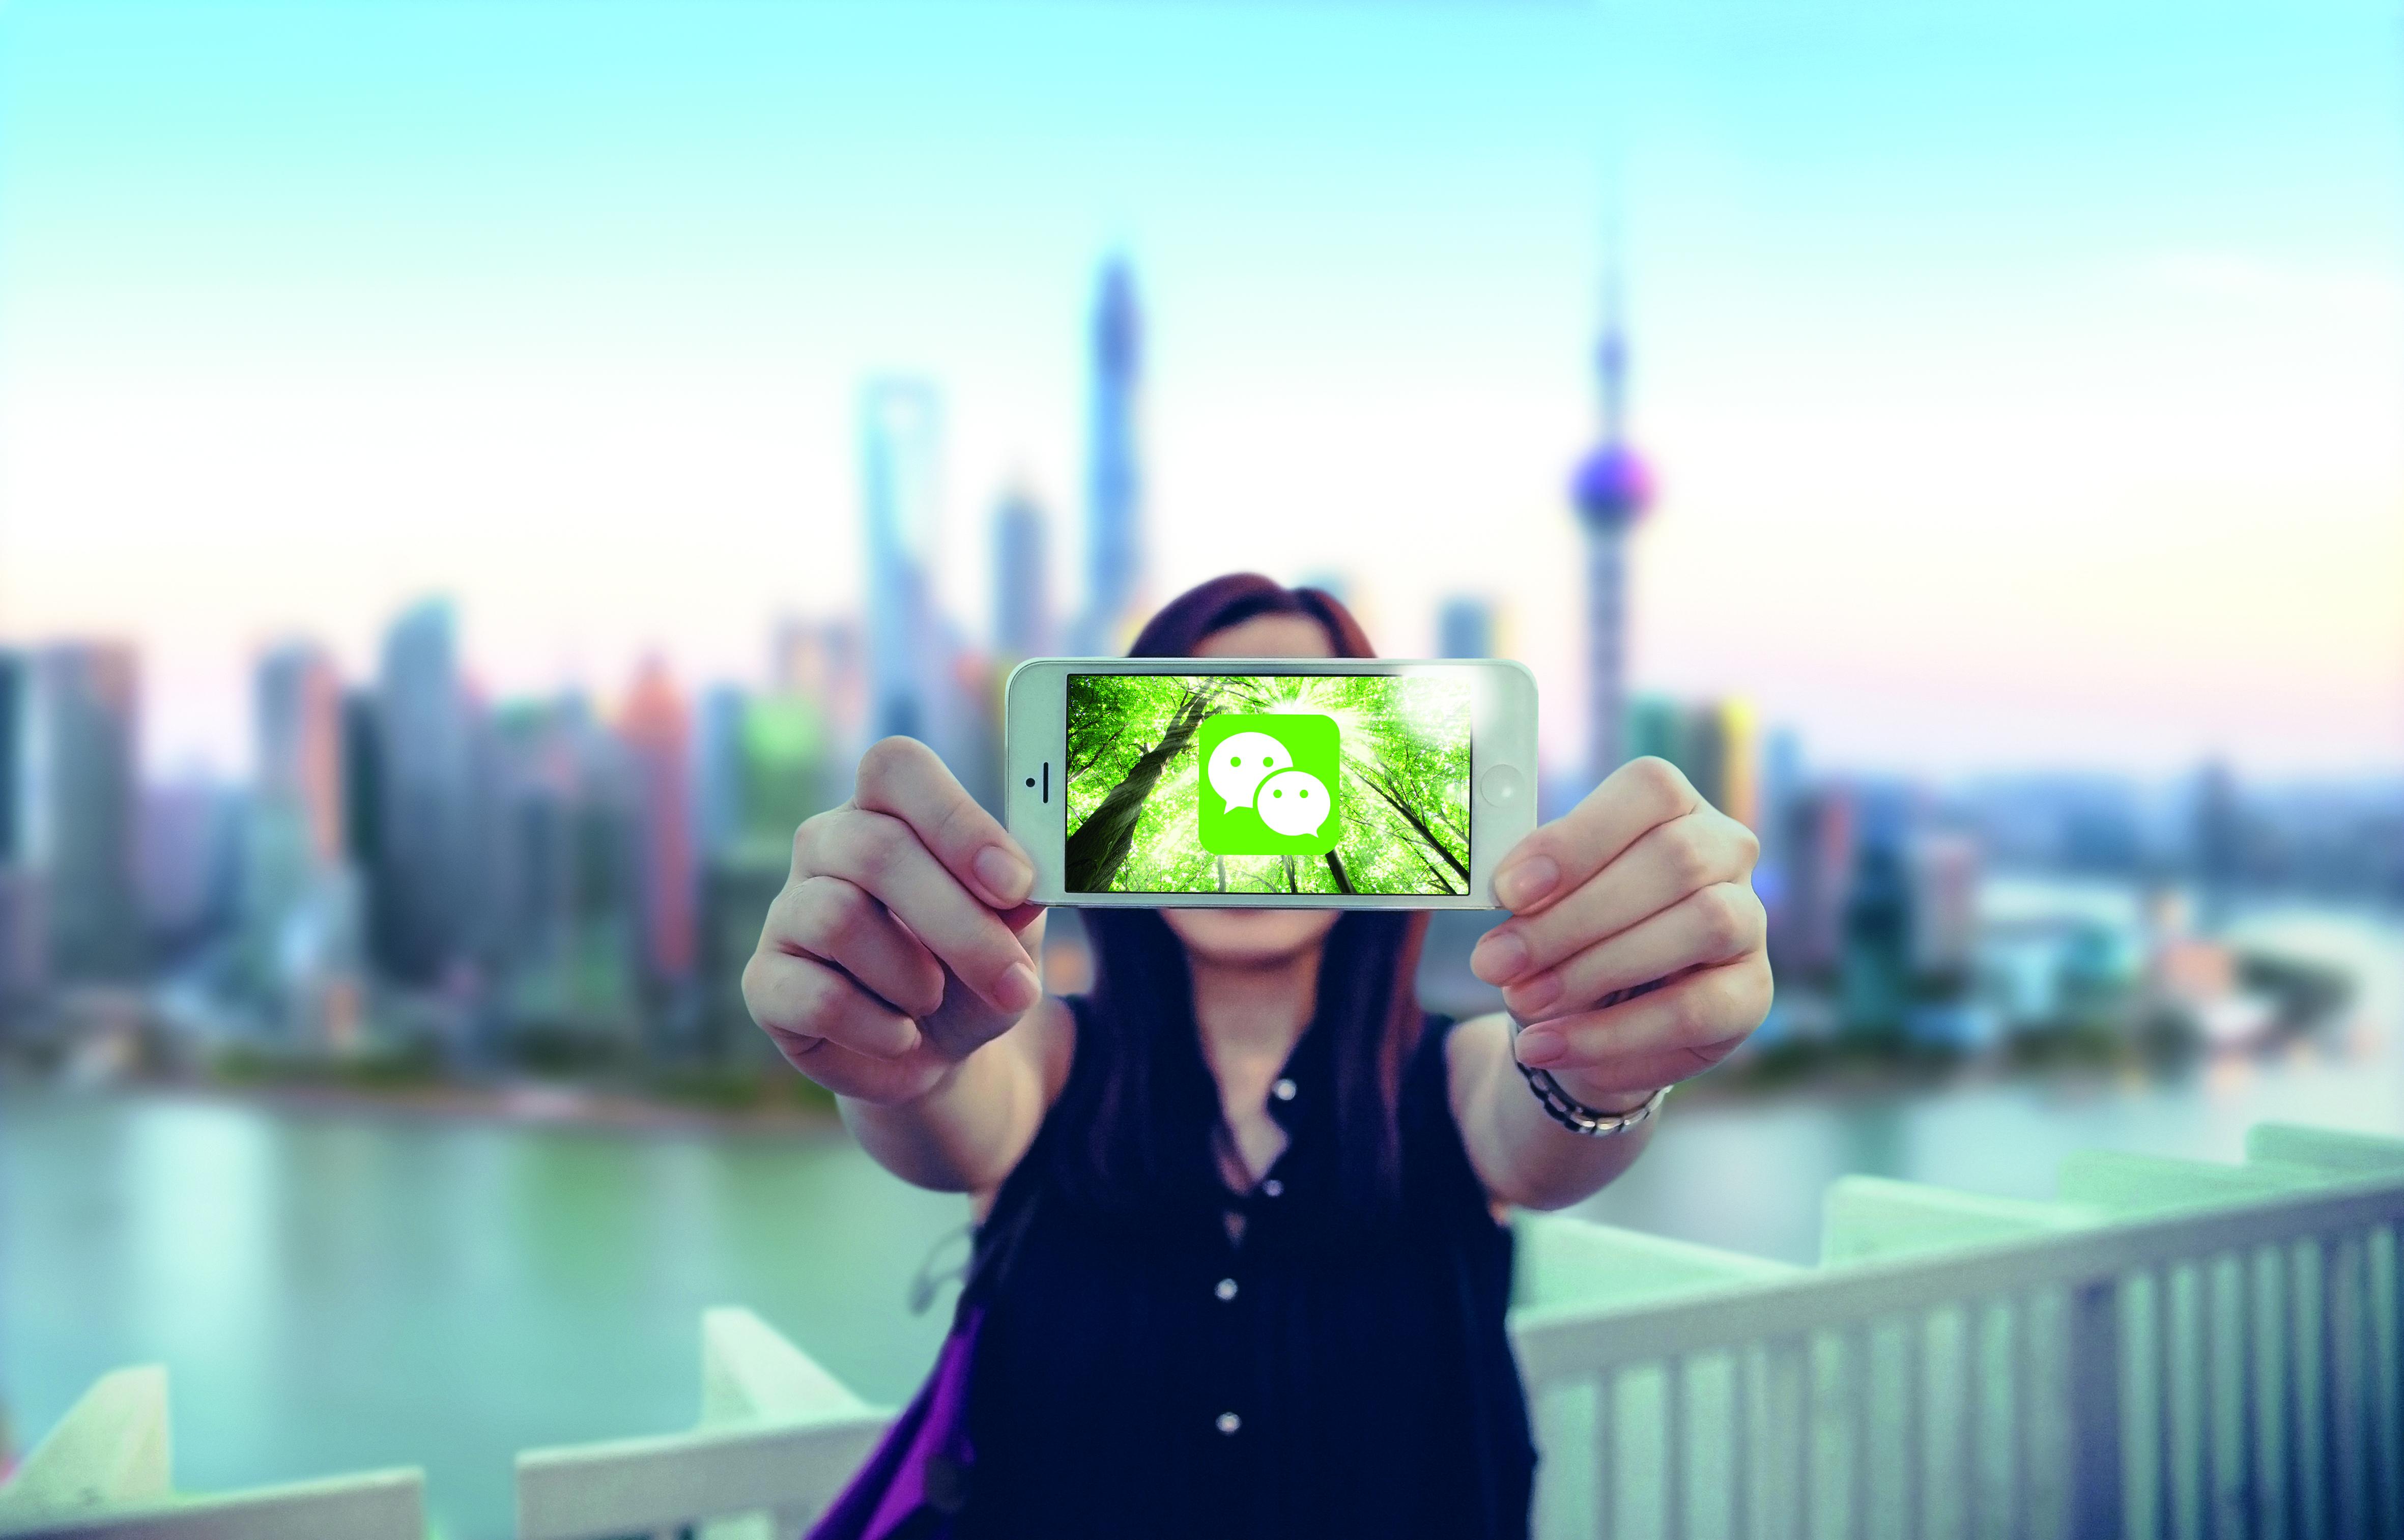 UPM_WeChat_Shanghai-girl_300dpi_CMYK.jpg